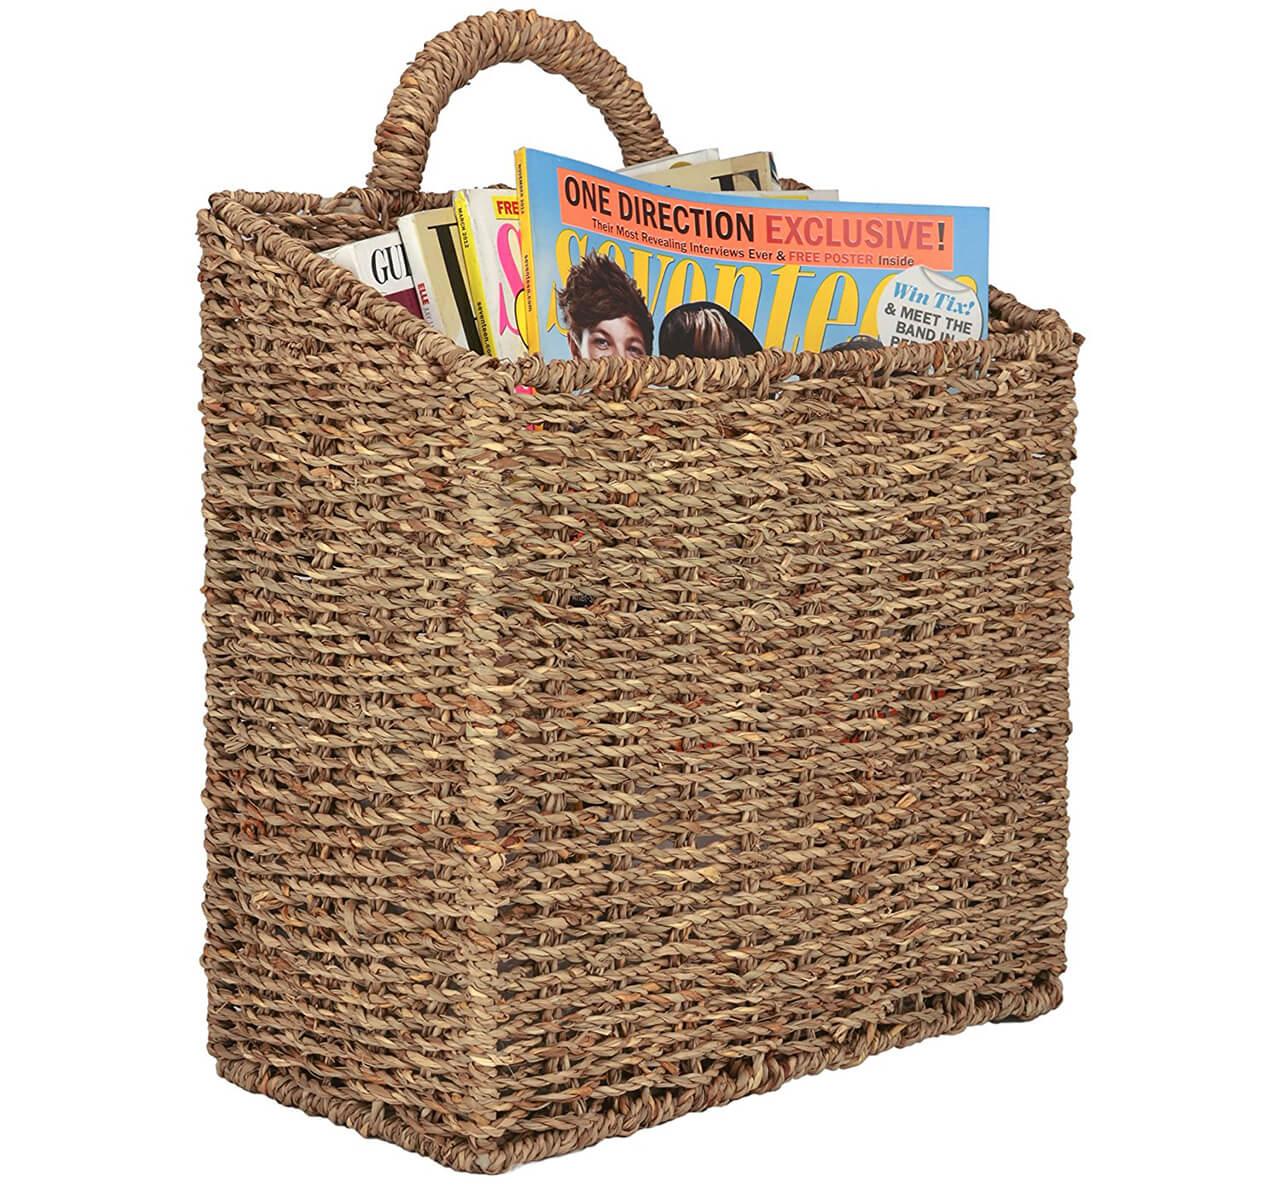 Rustic Wall-Mounted Magazine Basket